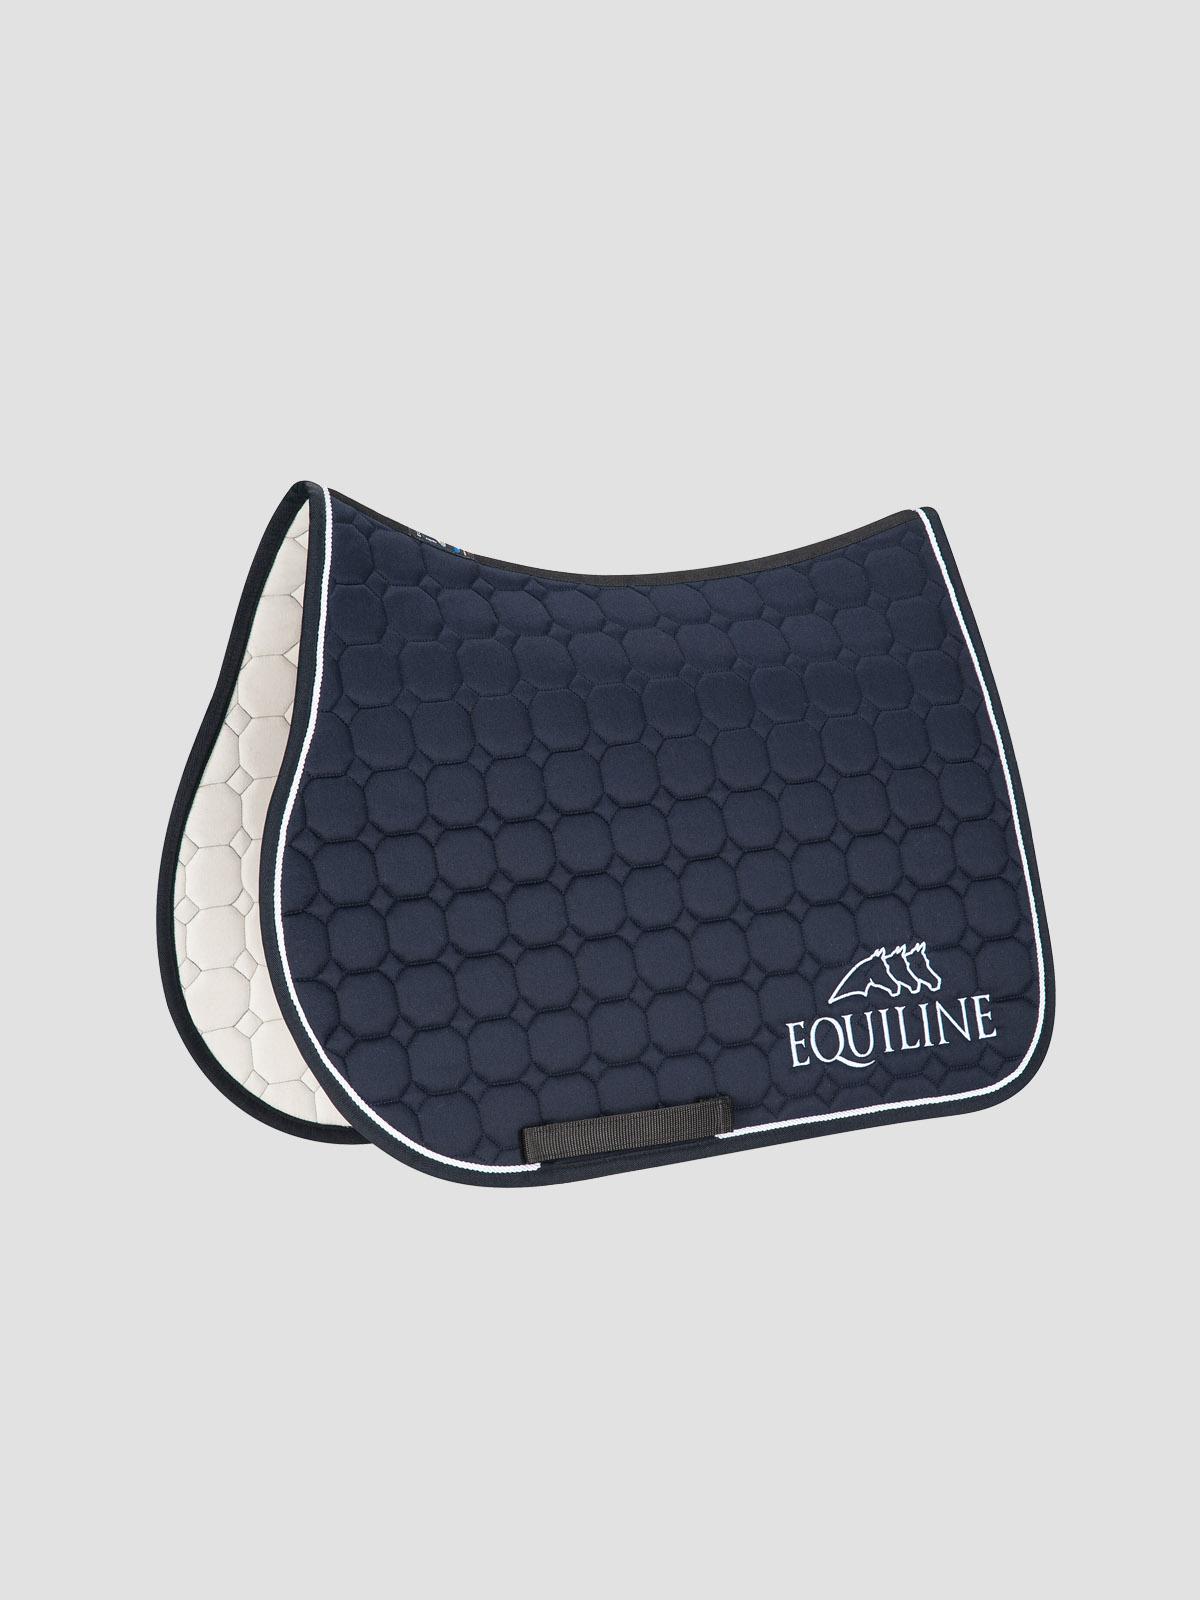 OUTLINE - Octagon Saddle Pad w/ Logo 1